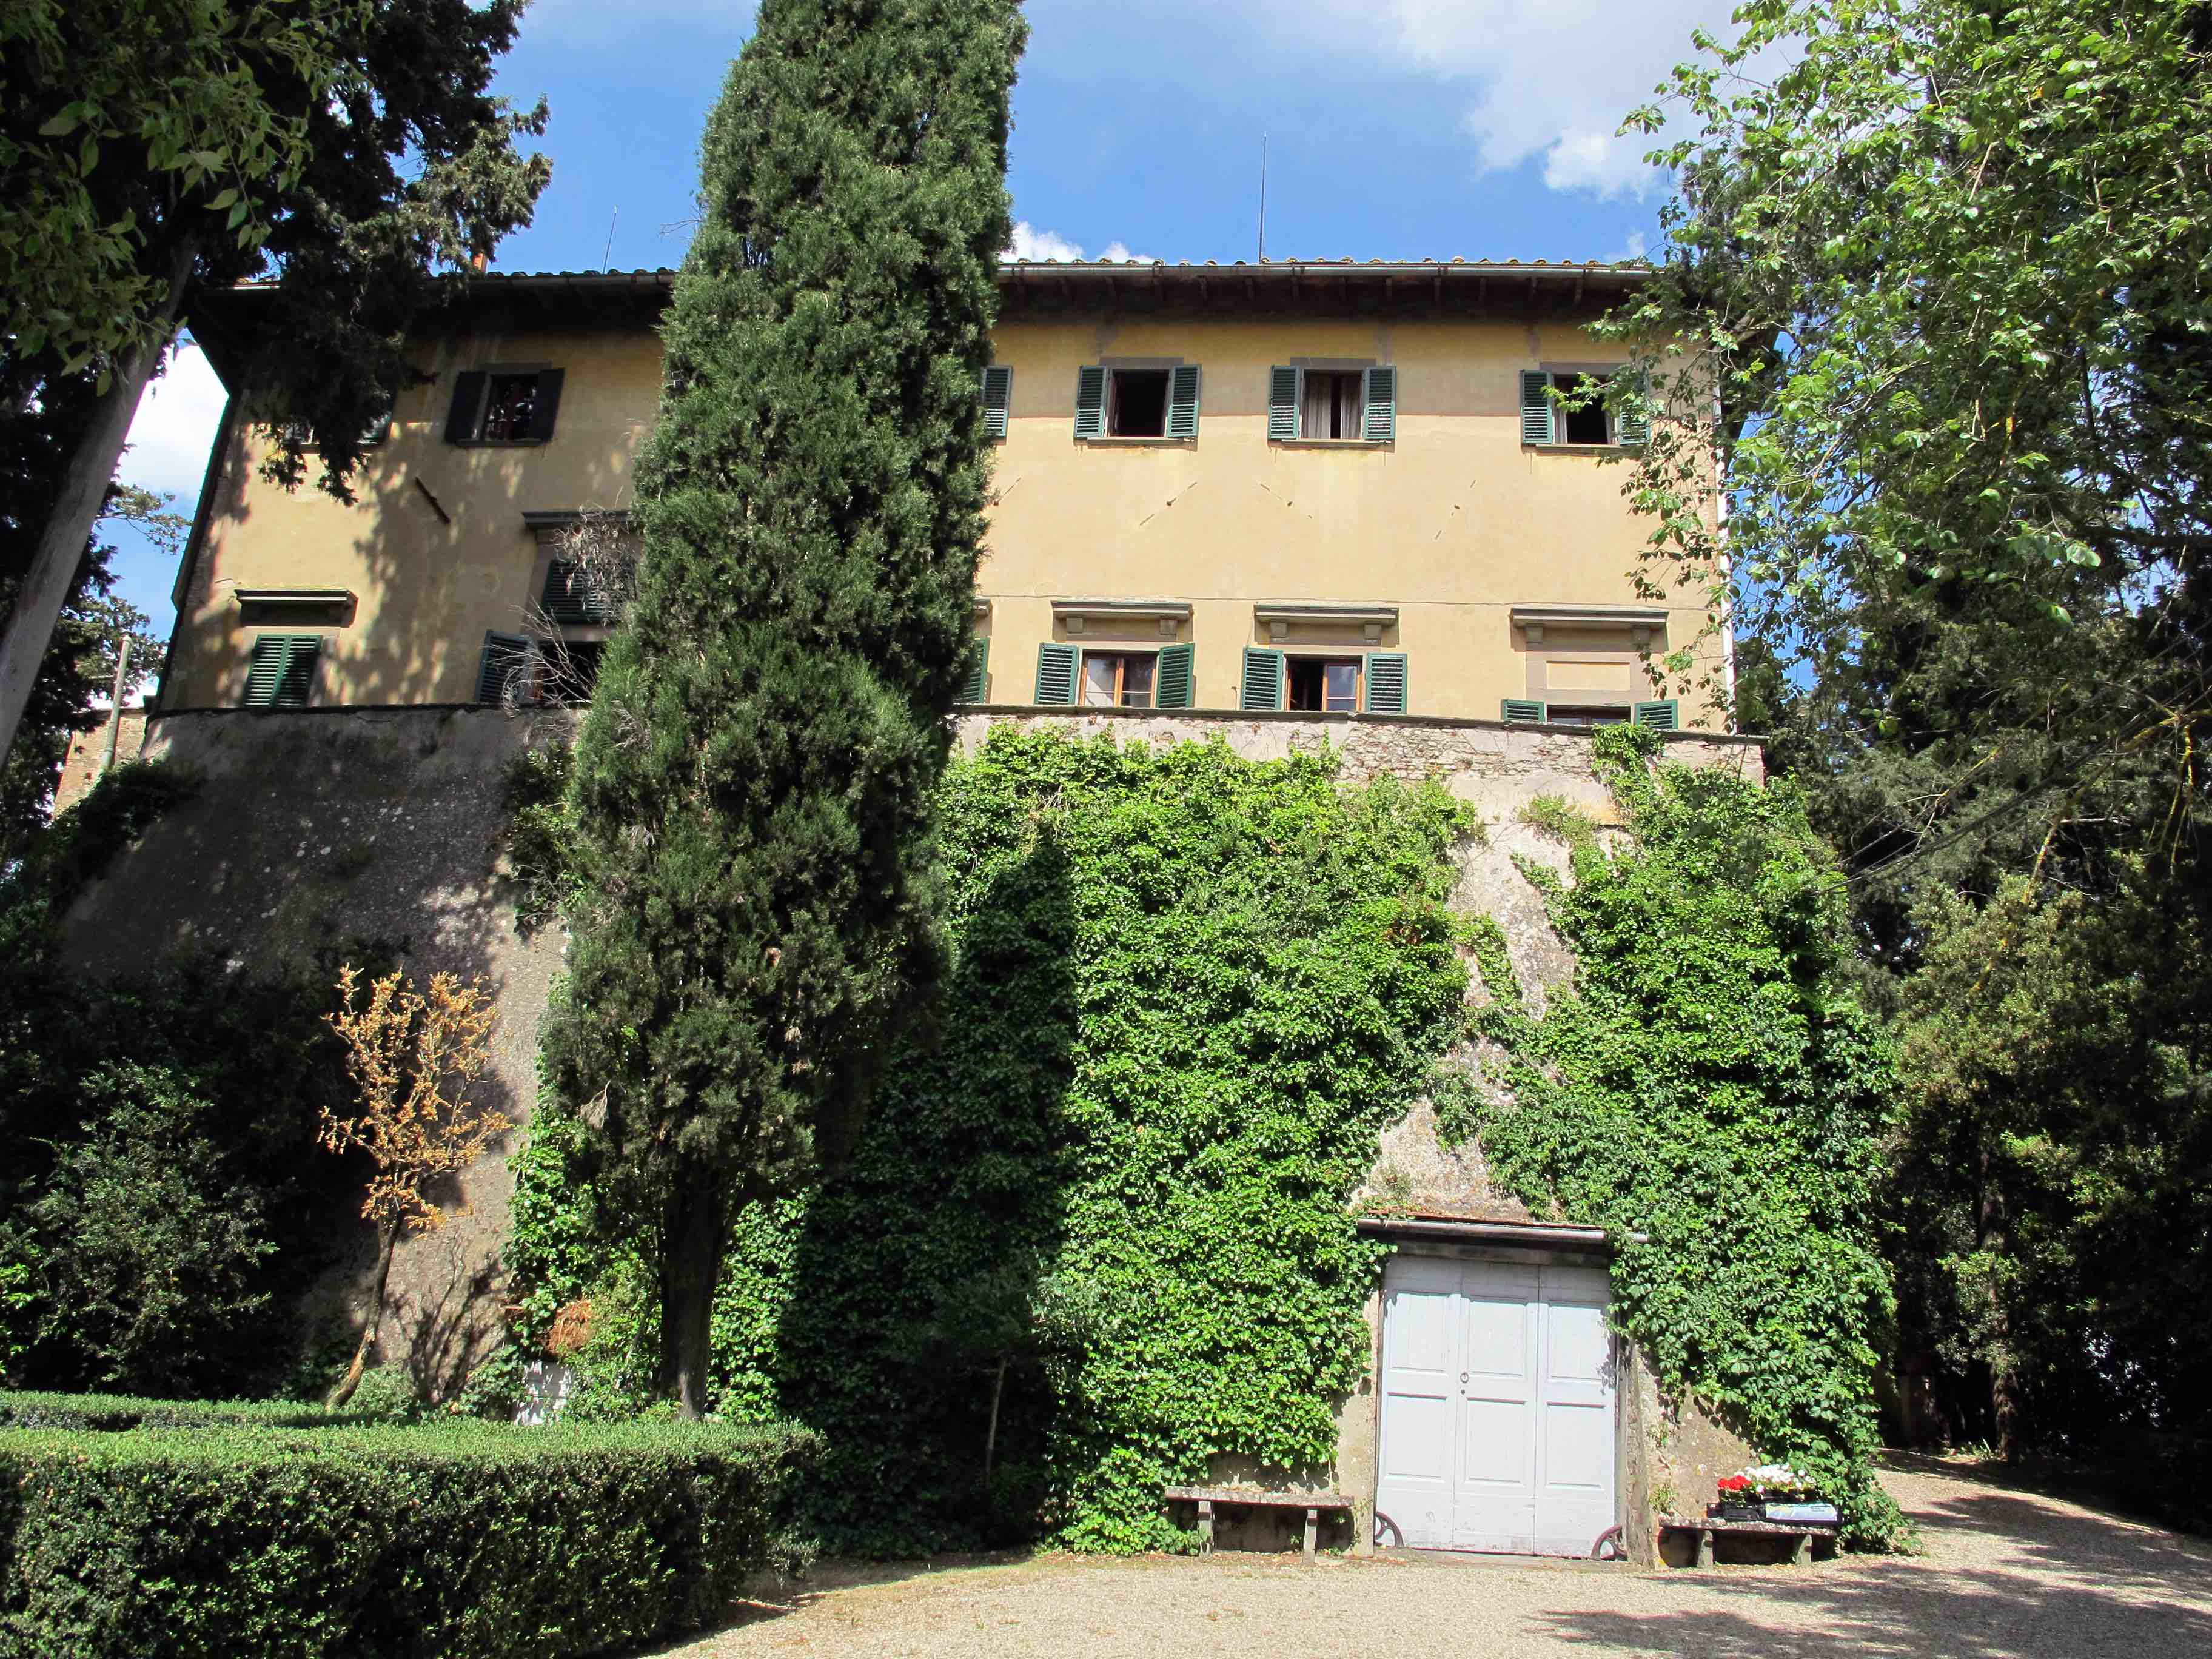 Castello Sonnino villa, Montespertoli, Italy. (Photo: Sailko - Own work, CC BY 3.0, via wikimedia commons.)